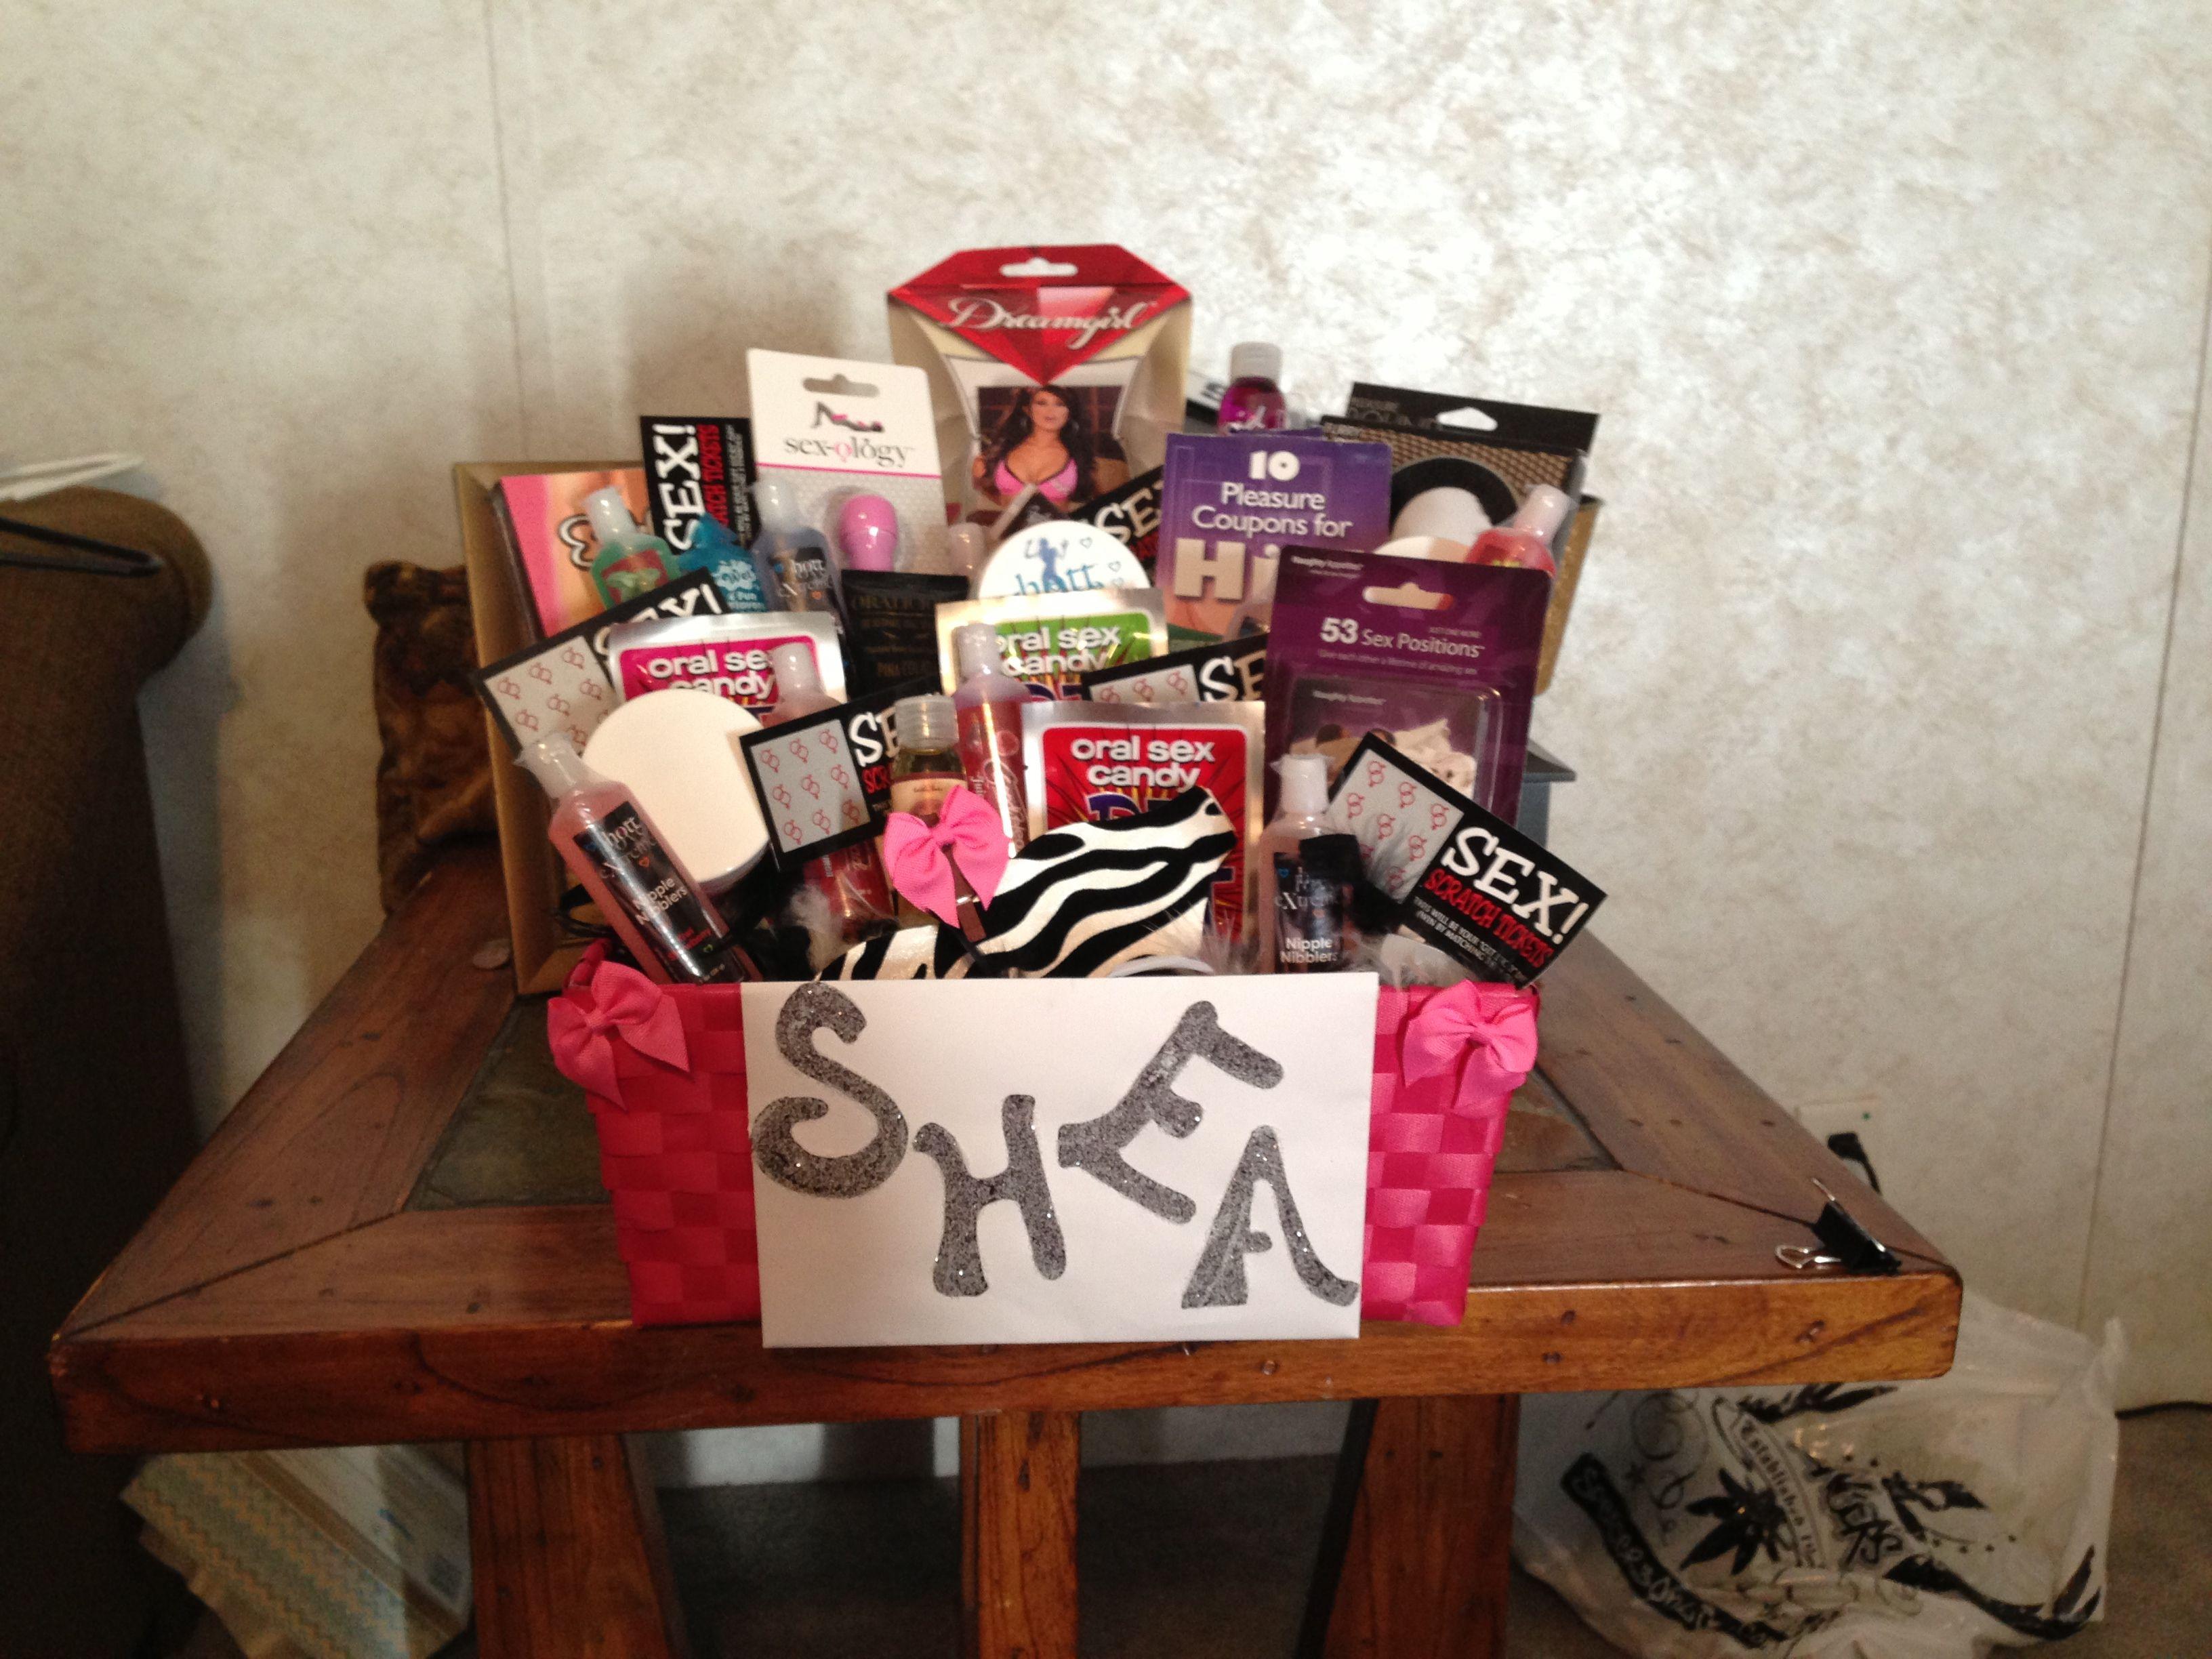 15 best R bachelorette and j bachlor gift images on Pinterest ...